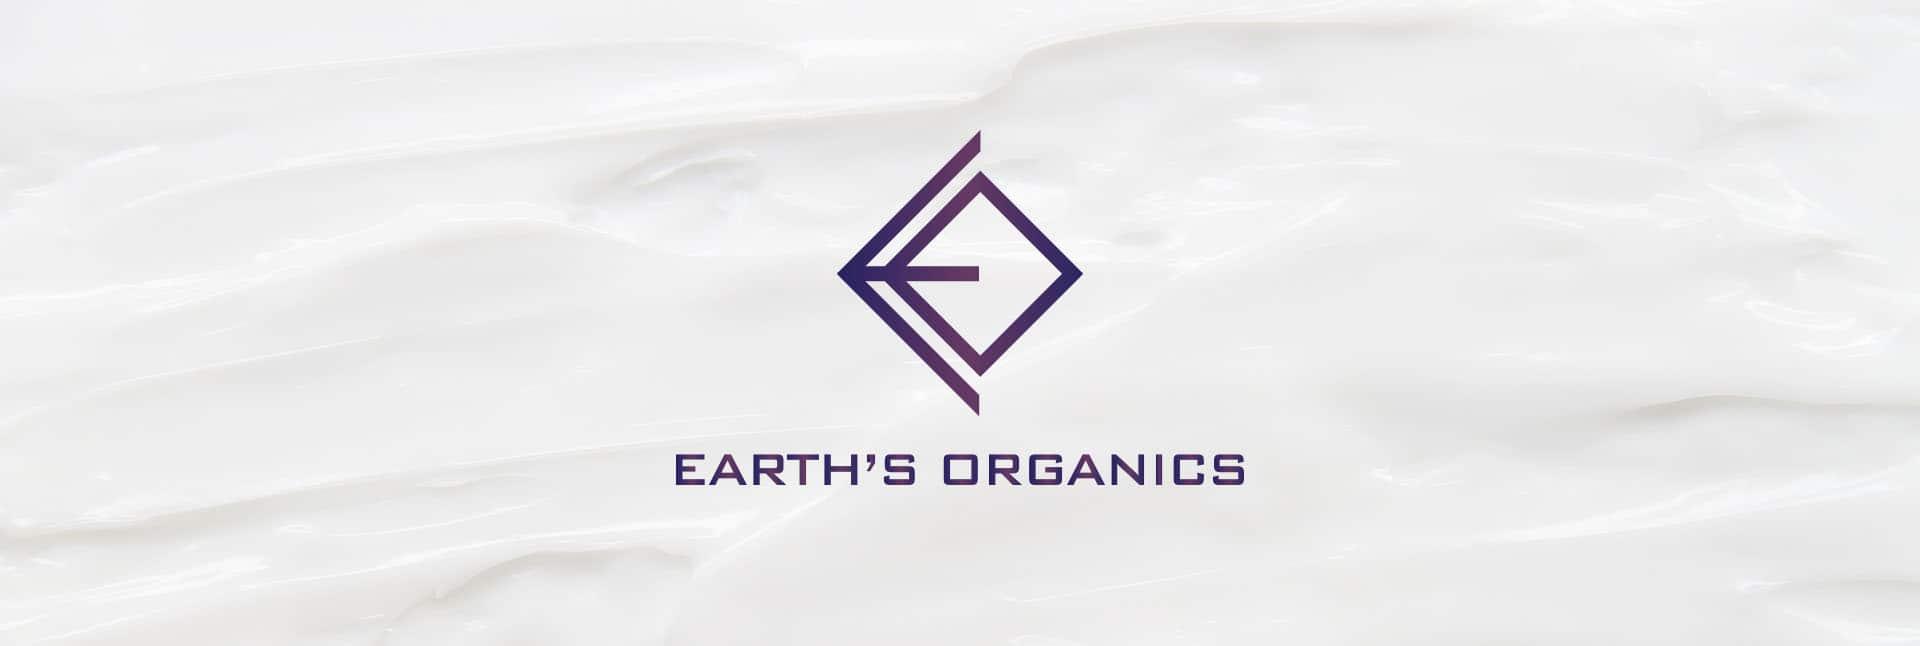 Earth's Organics - Logo Design